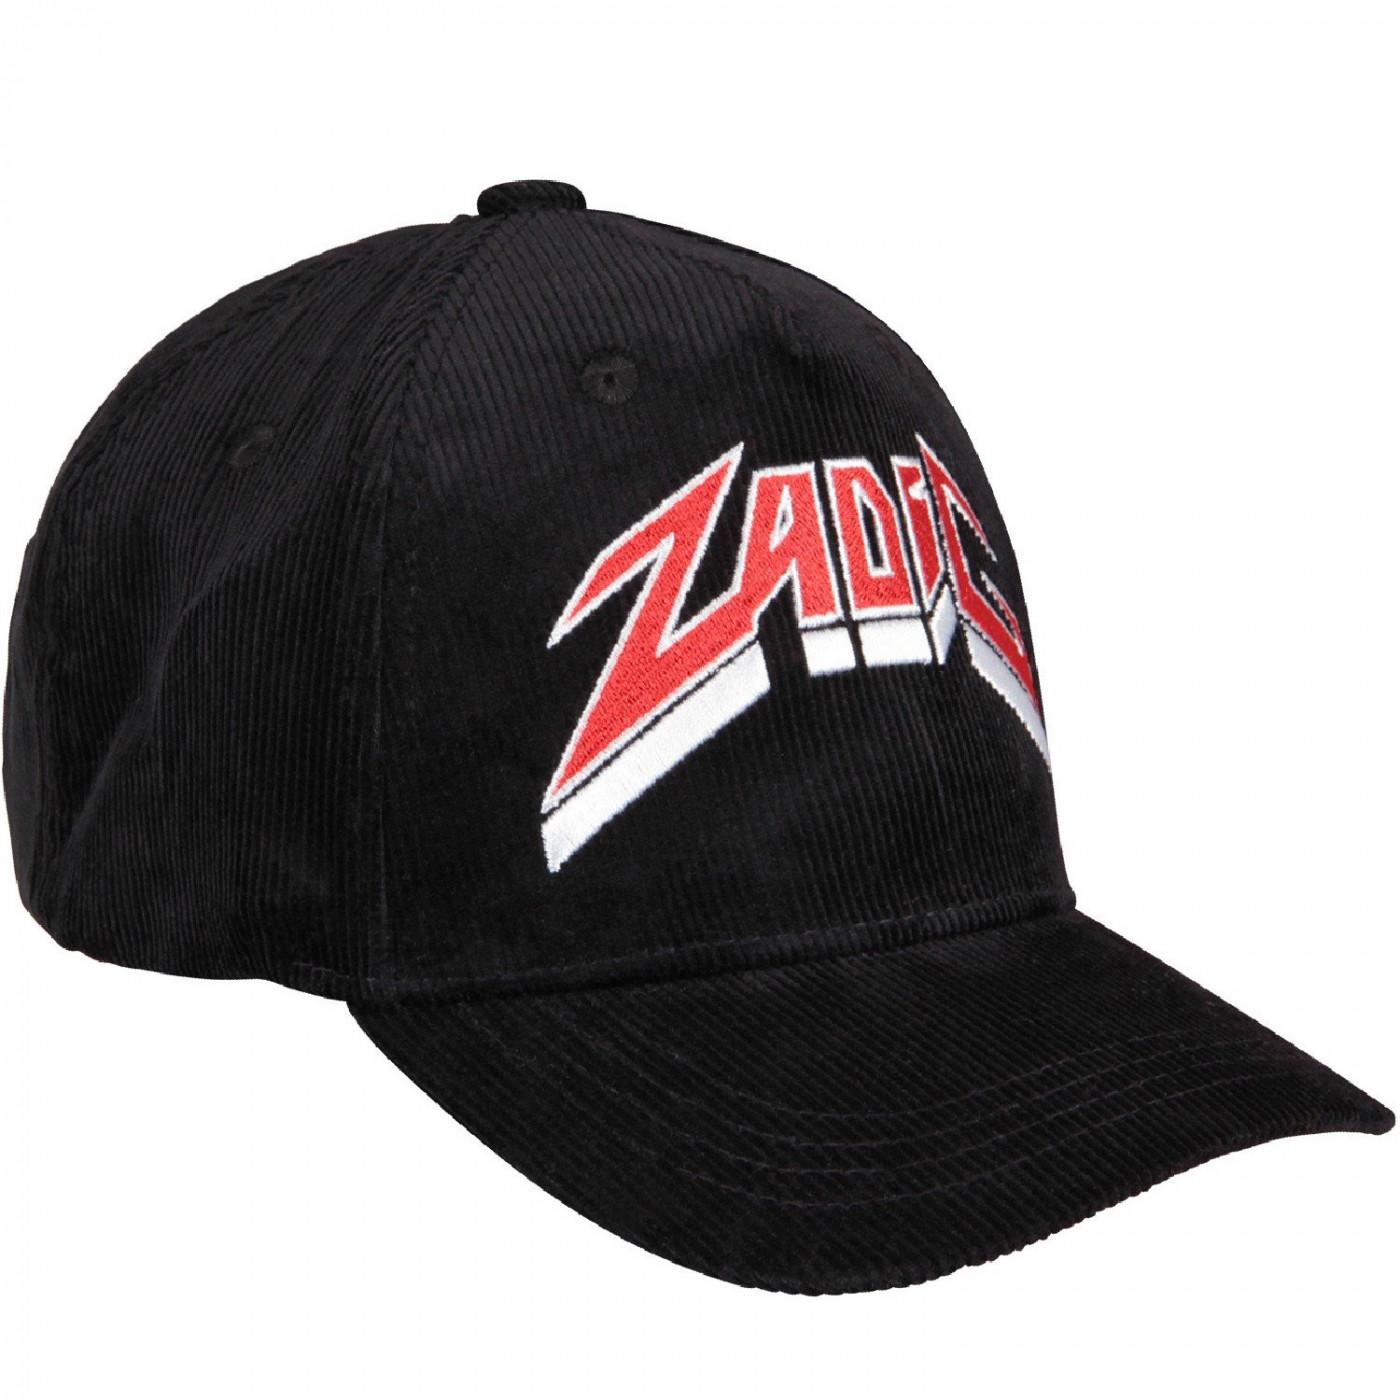 Бейсболка Zadig & voltaire X21009-85L